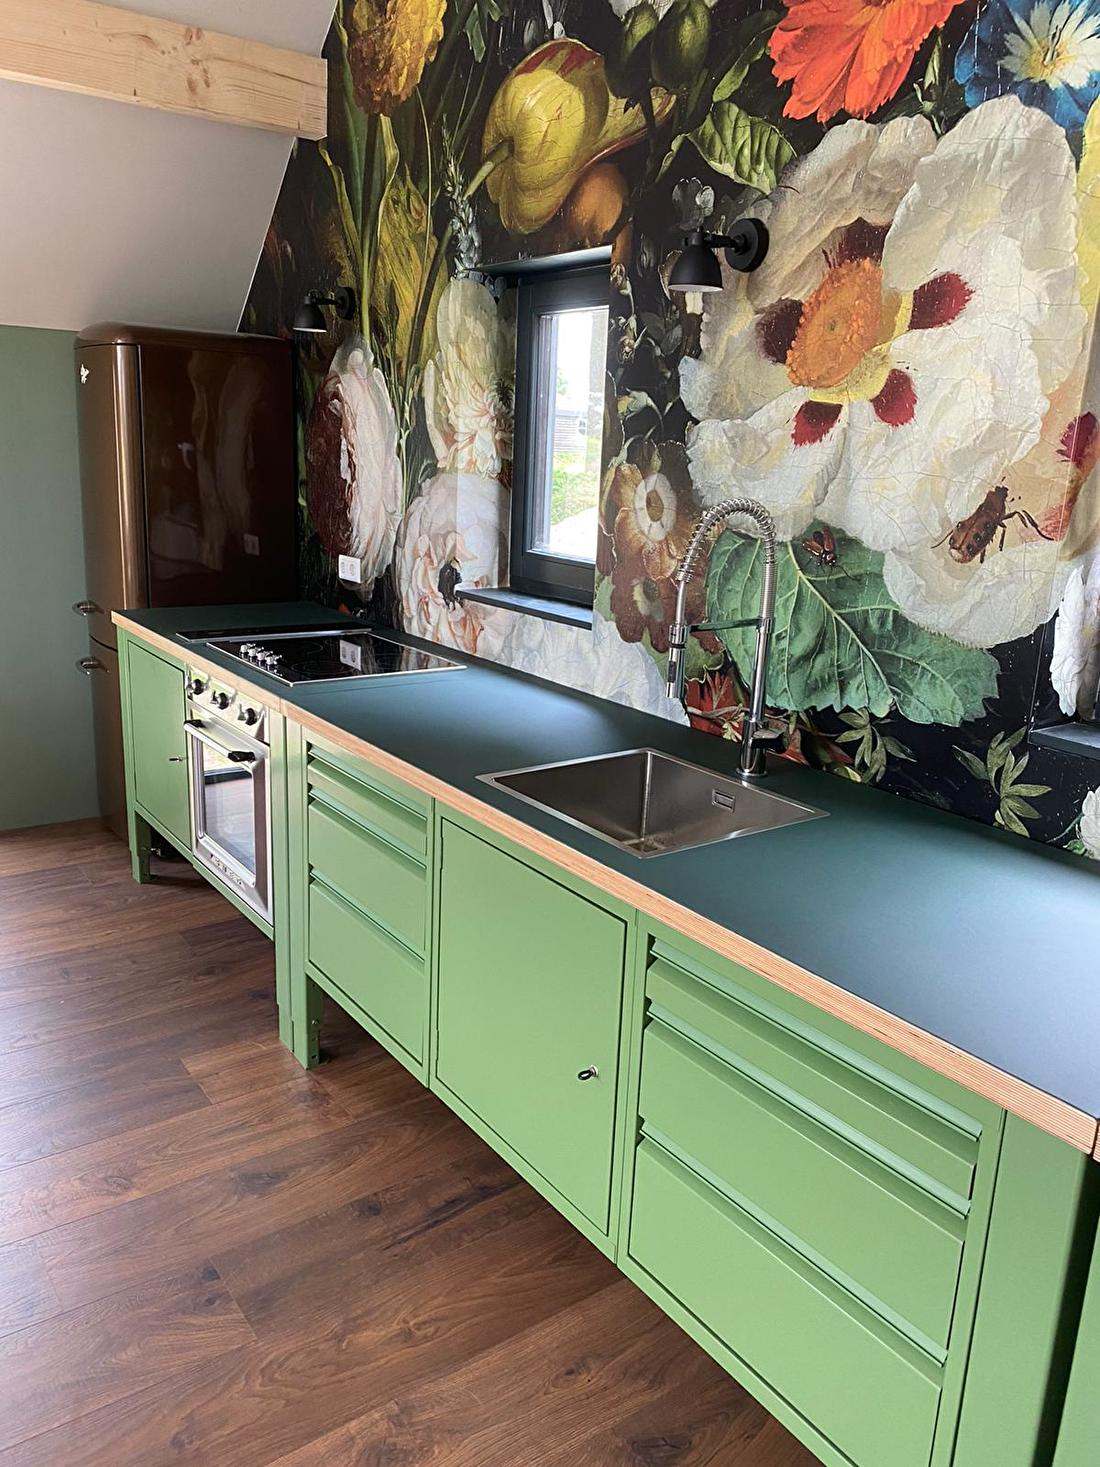 module werkbank keuken machinegroen big easy